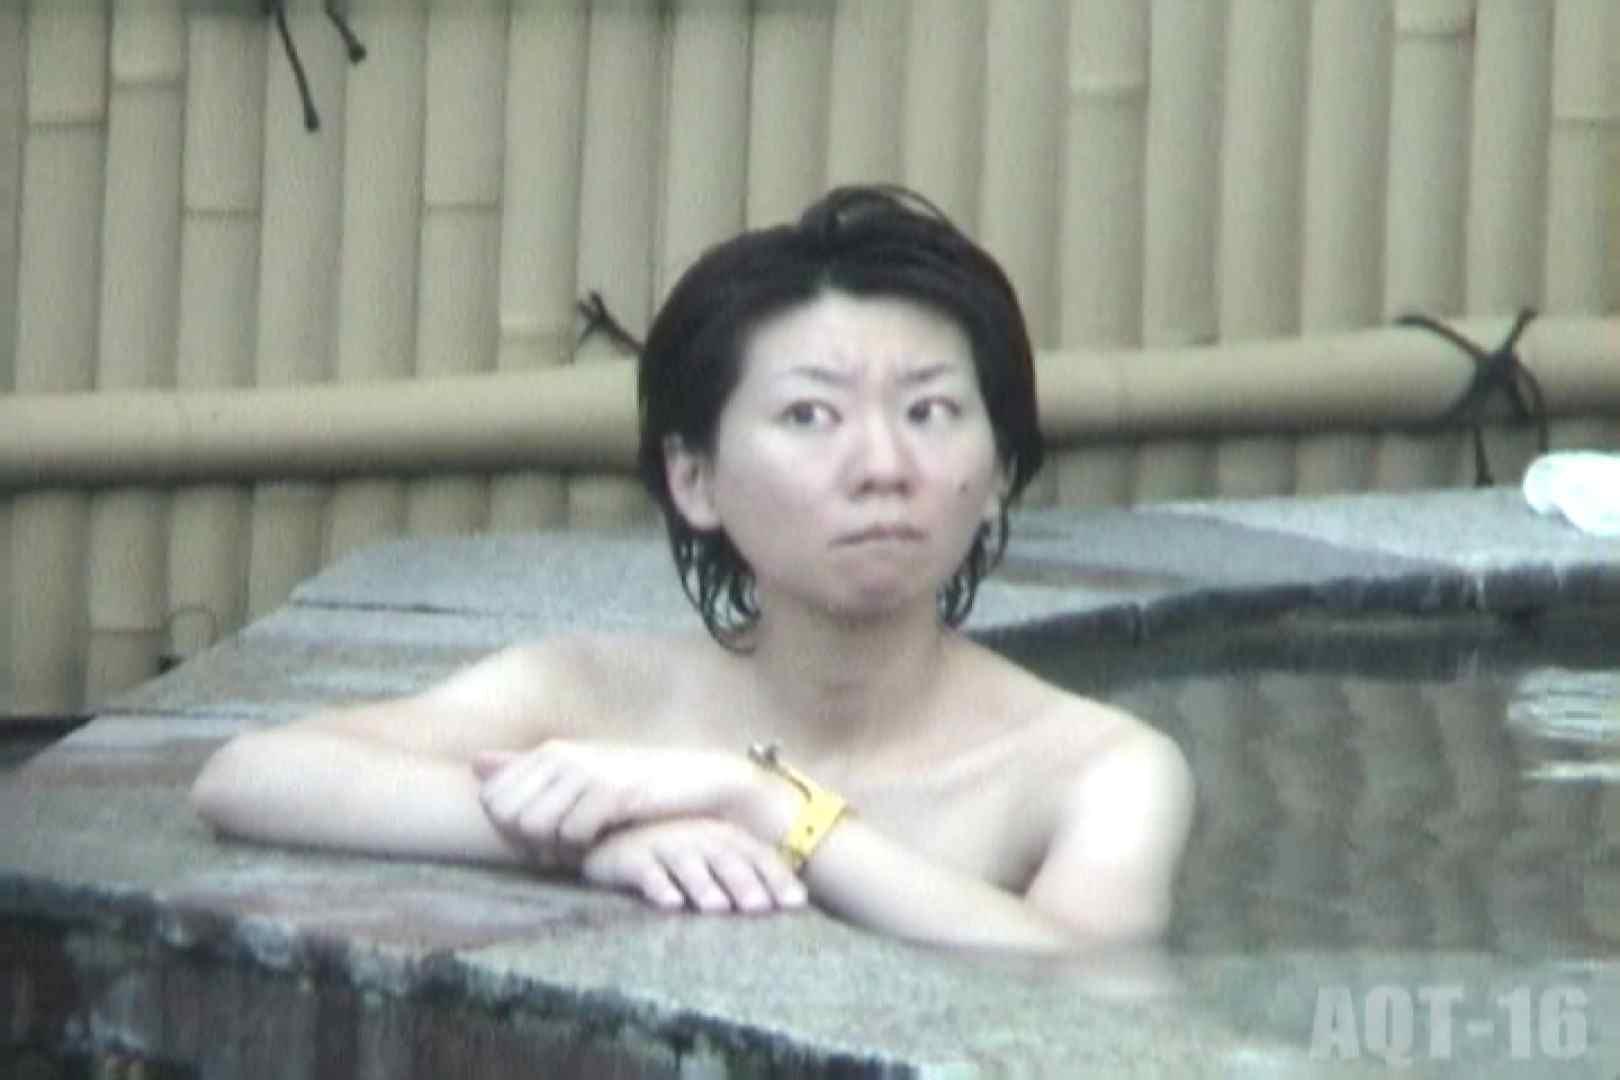 Aquaな露天風呂Vol.842 露天風呂突入 AV動画キャプチャ 96pic 74